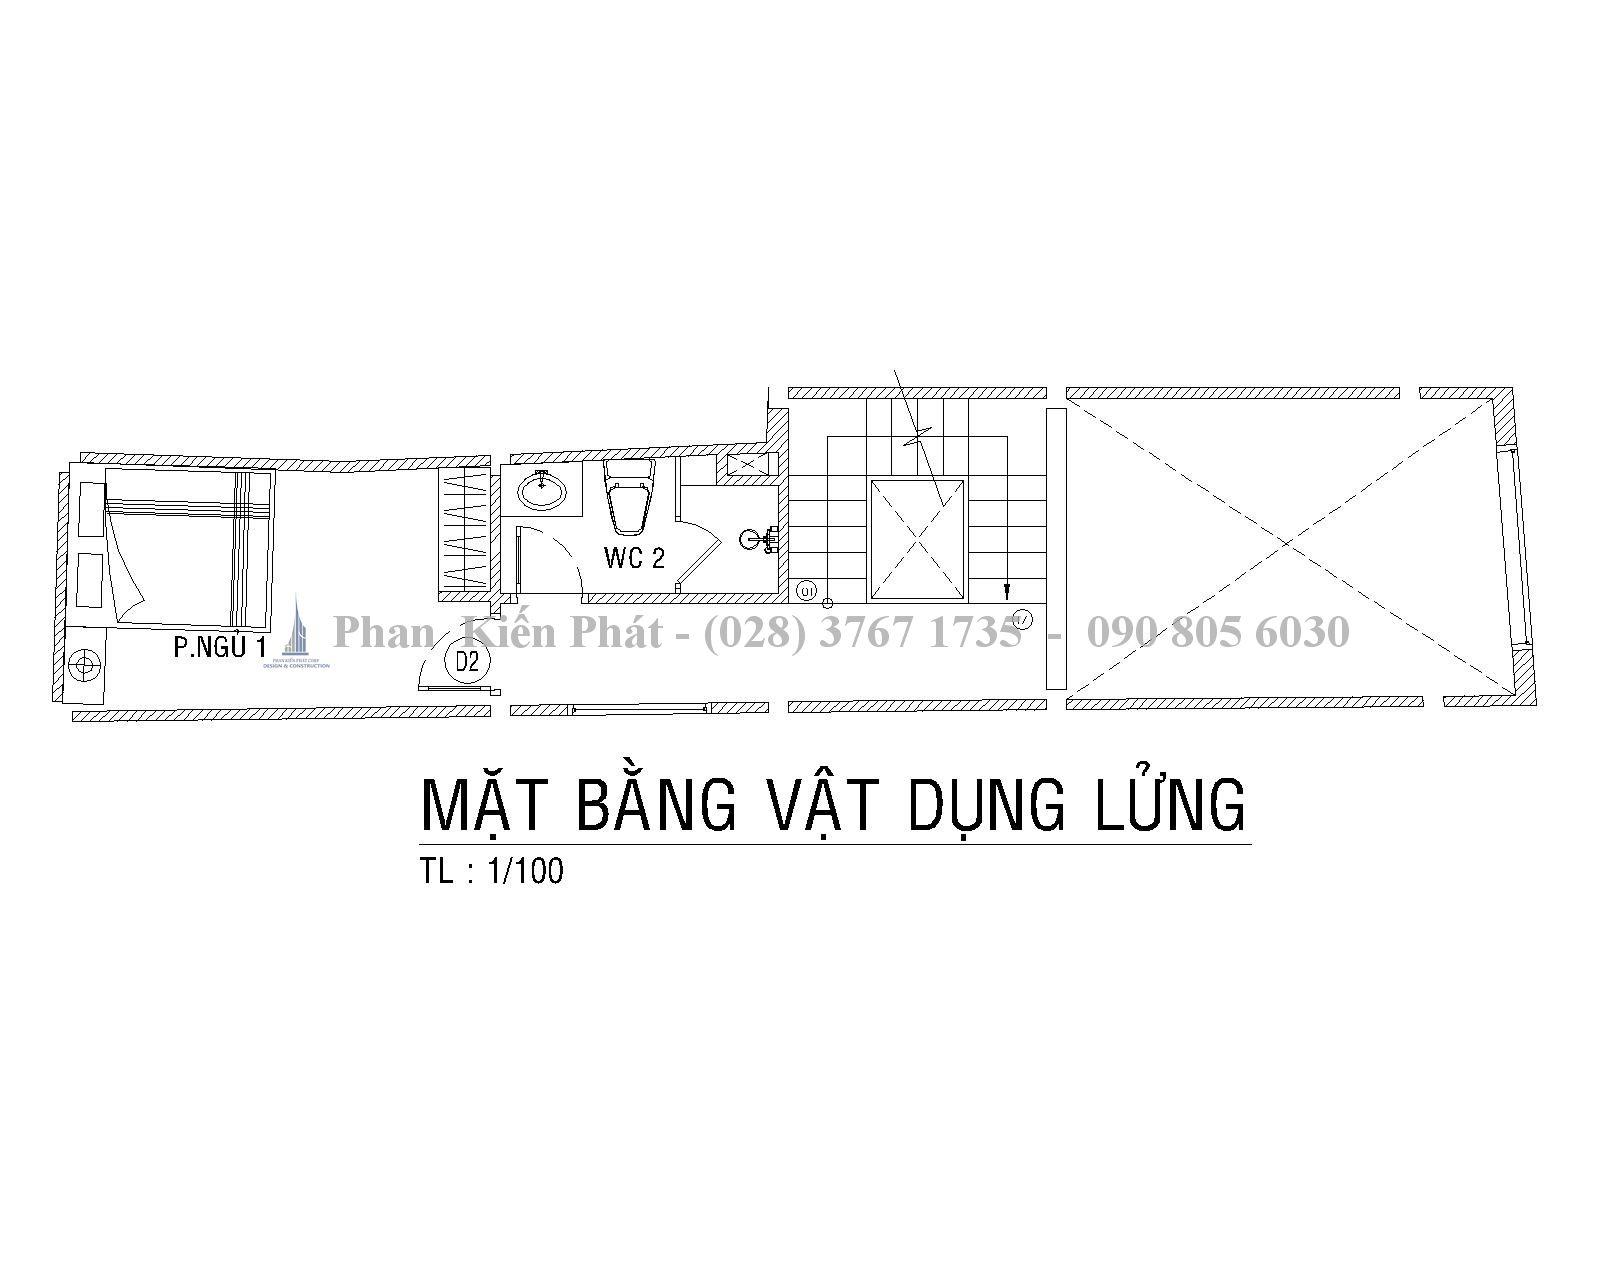 Mat Bang Lung Mau Nha Ong 1 Tret 1lung 3 Lau Hien Dai Anh Tan Dinh 1